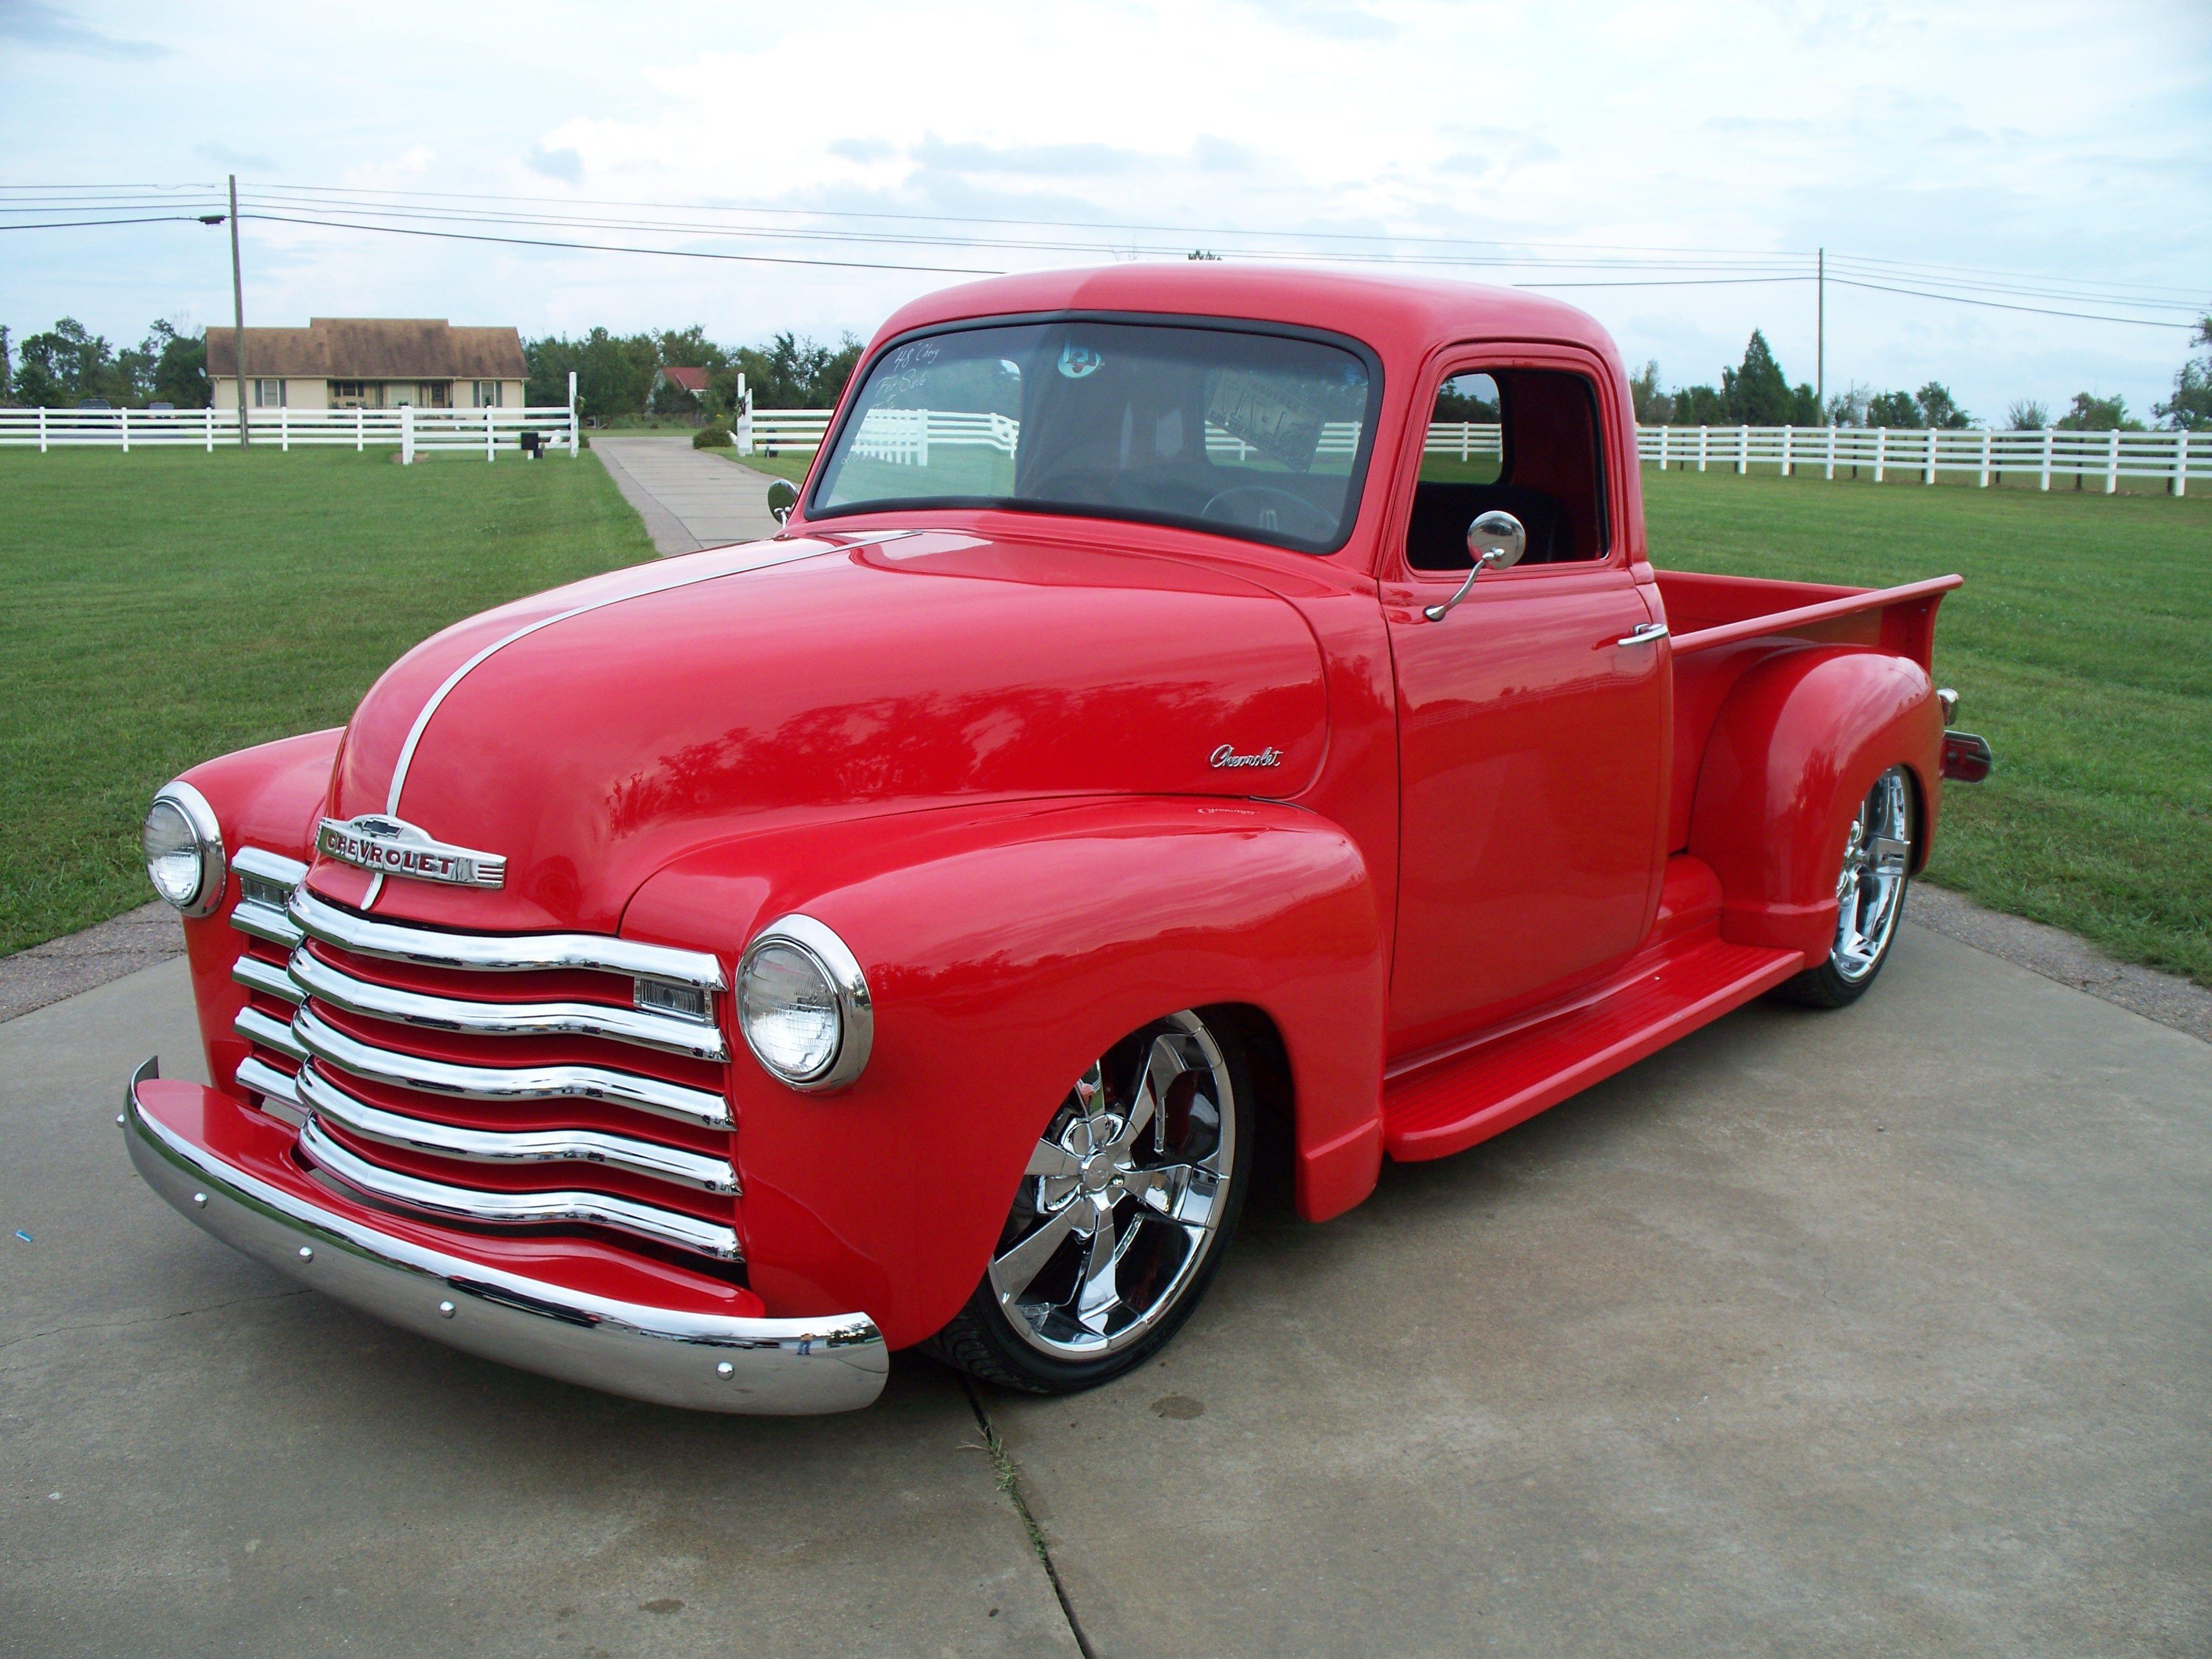 classic chevrolet truck | Classic Cars | Rat Rods & Hot Rods ...